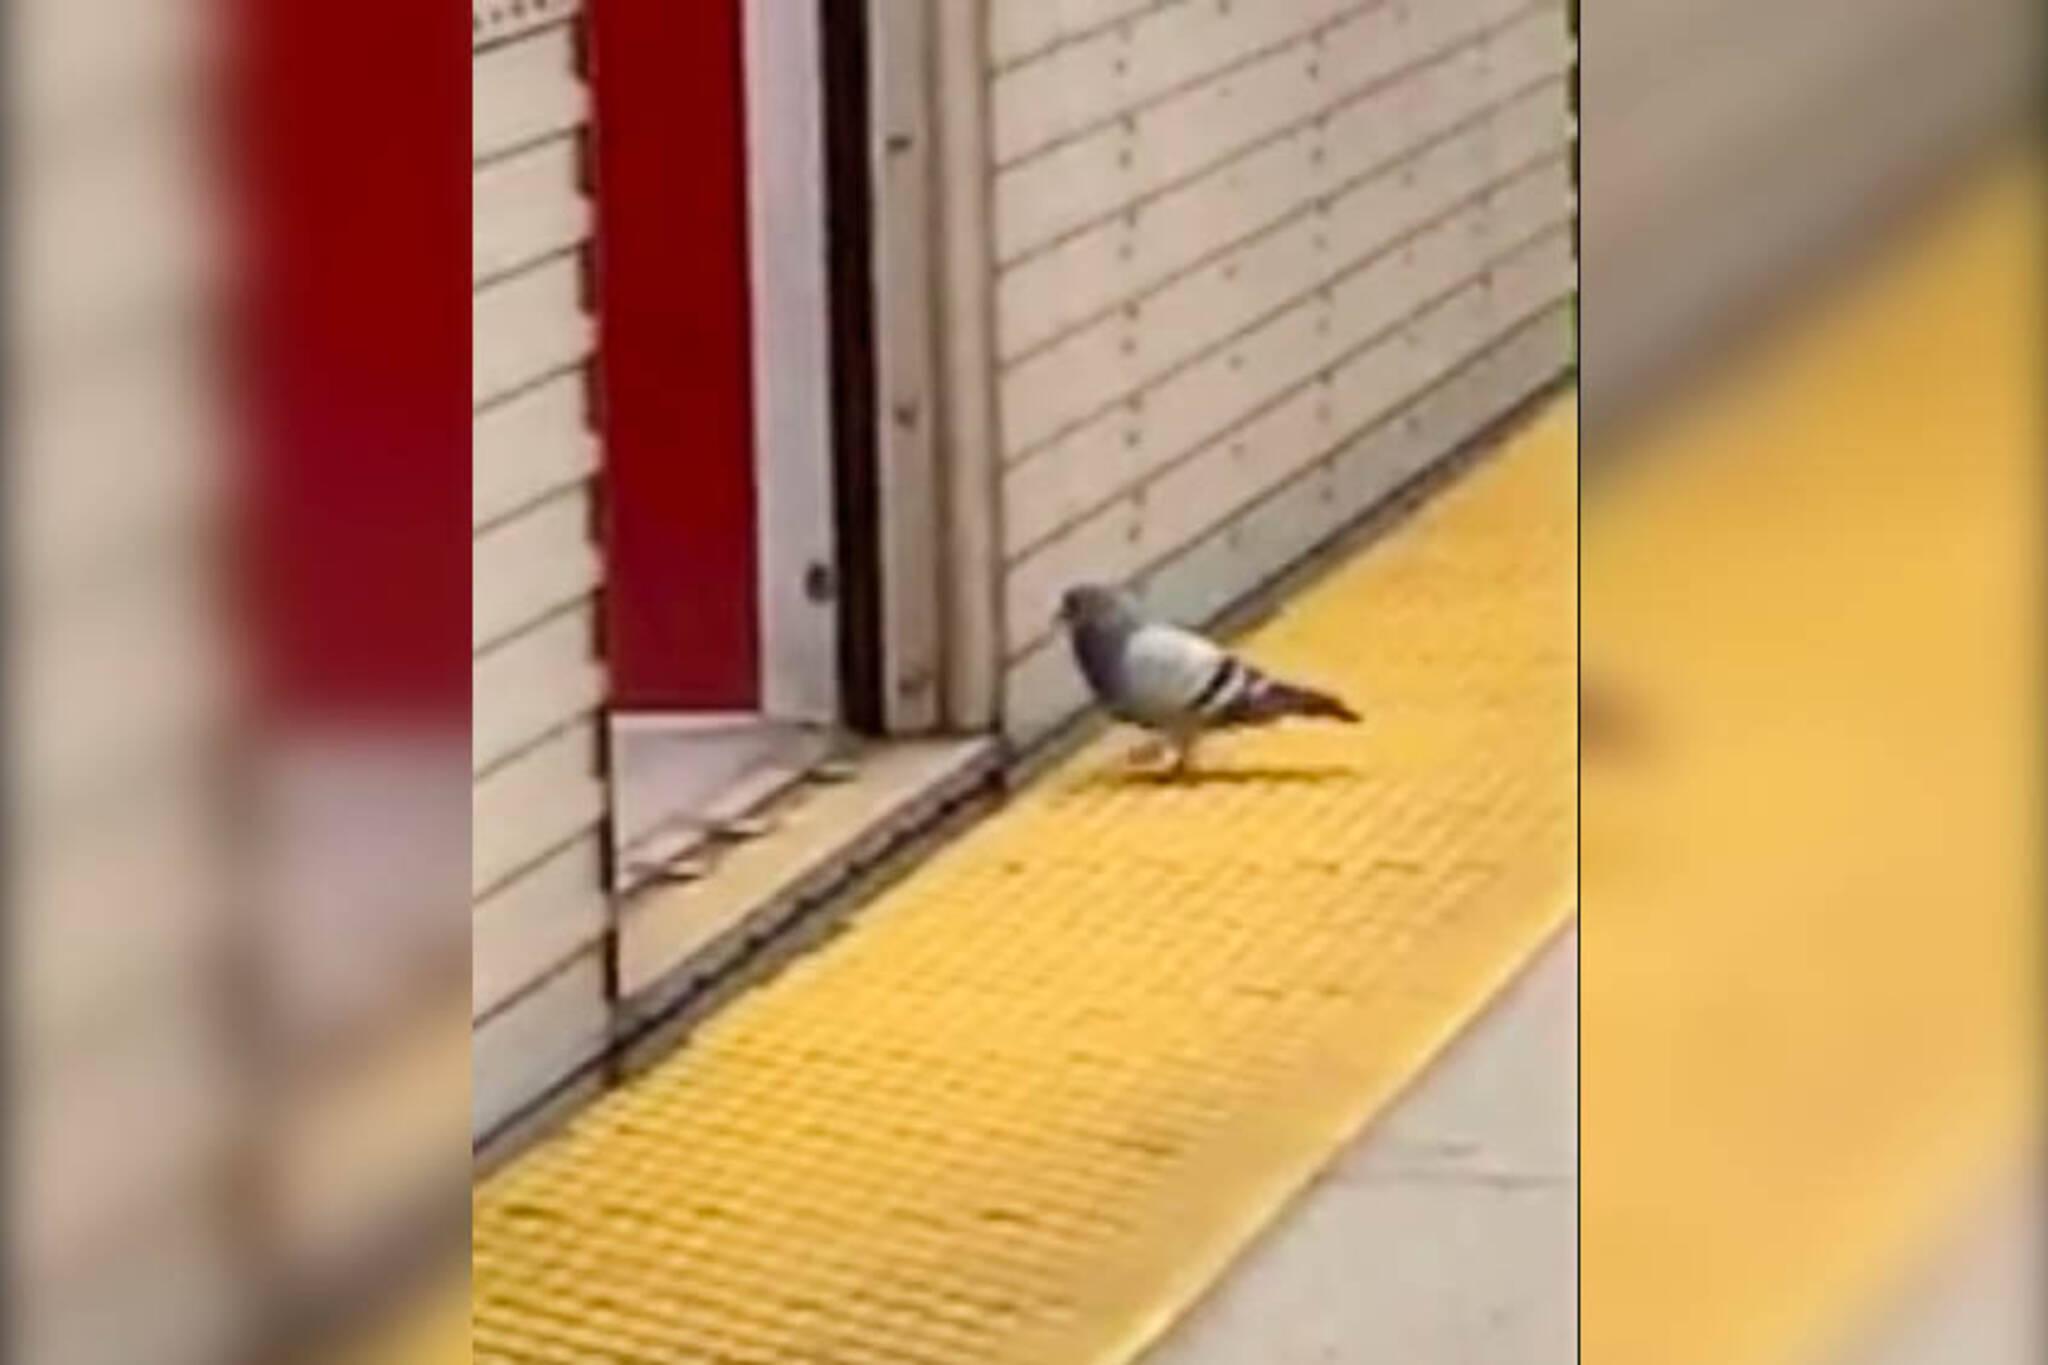 Toronto pigeon subway